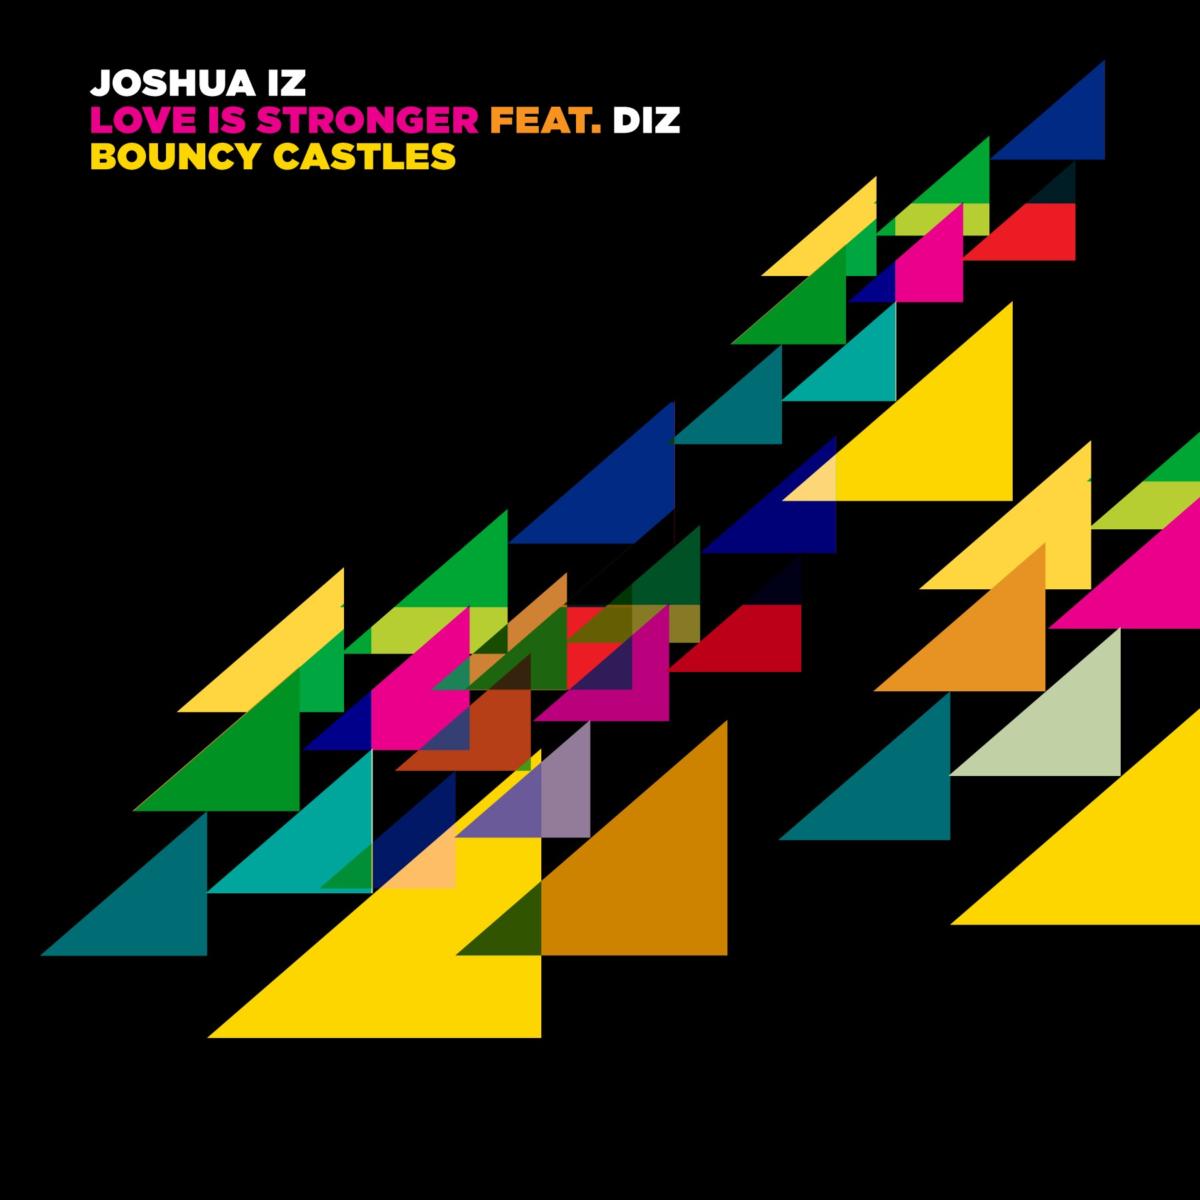 VIZ018 Joshua Iz - Love Is Stronger feat. Diz/Bouncy Castles